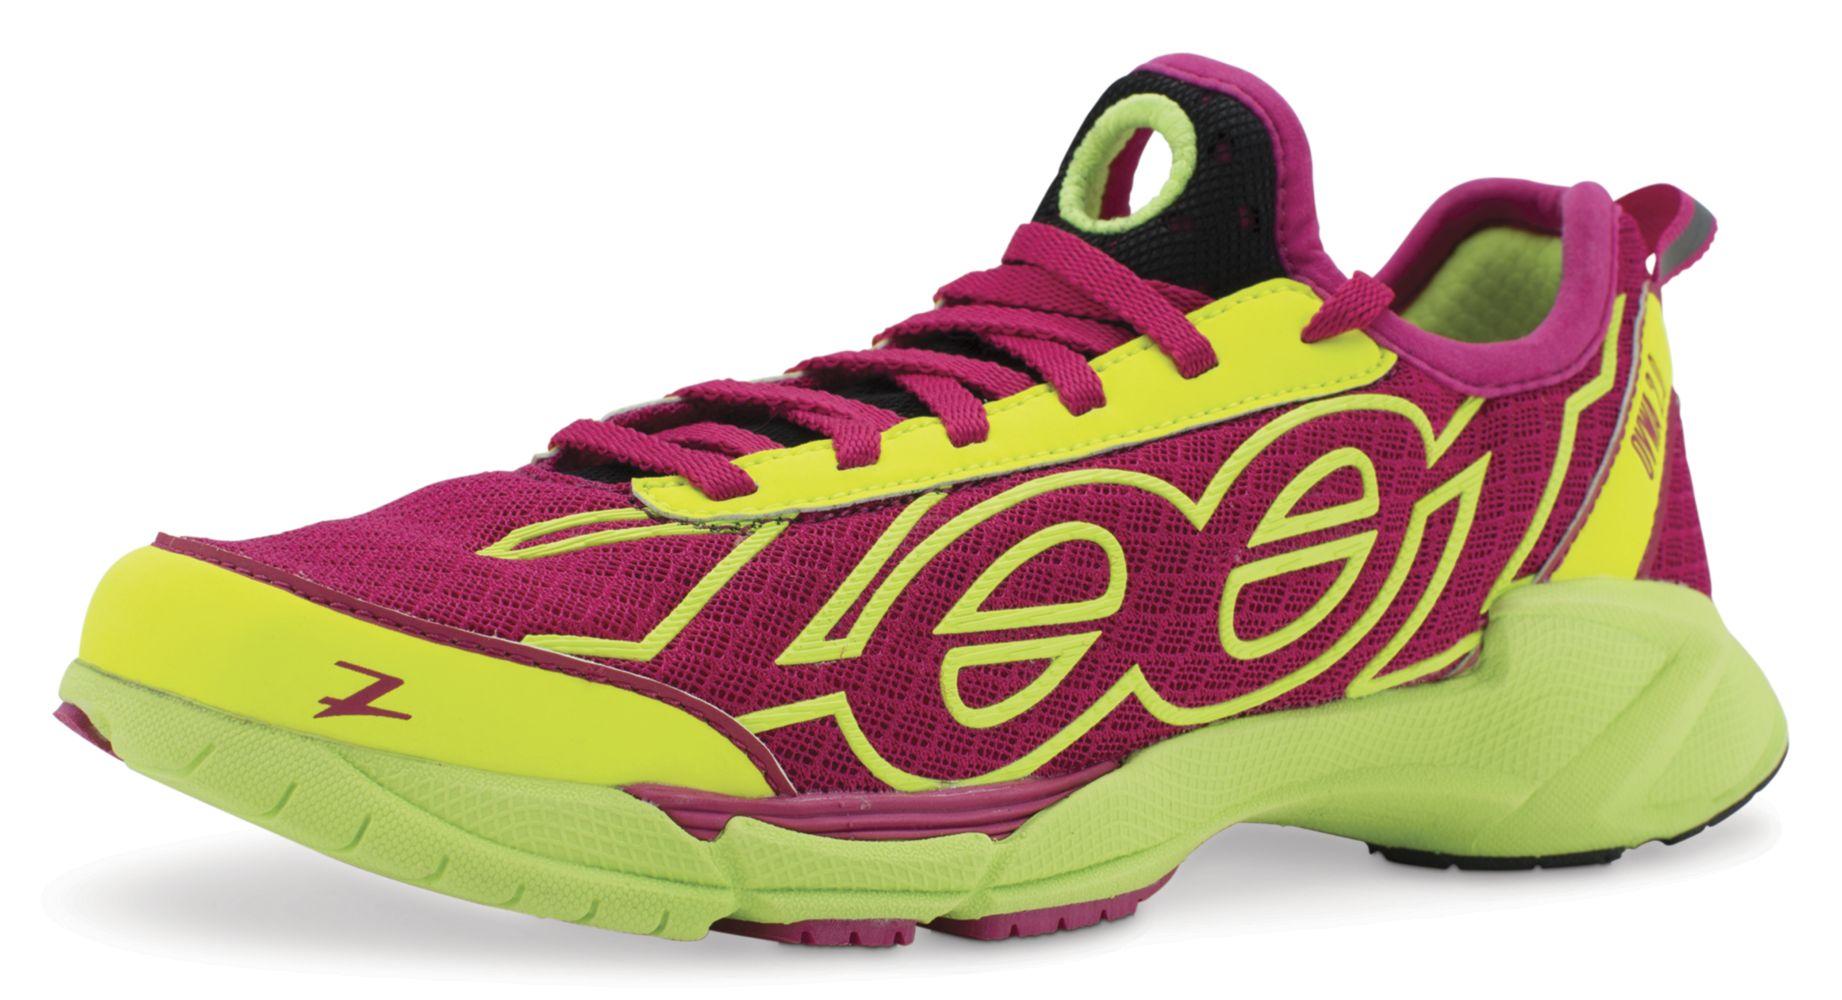 Zoot Ultra Ovwa Running Shoes (For Women) 13